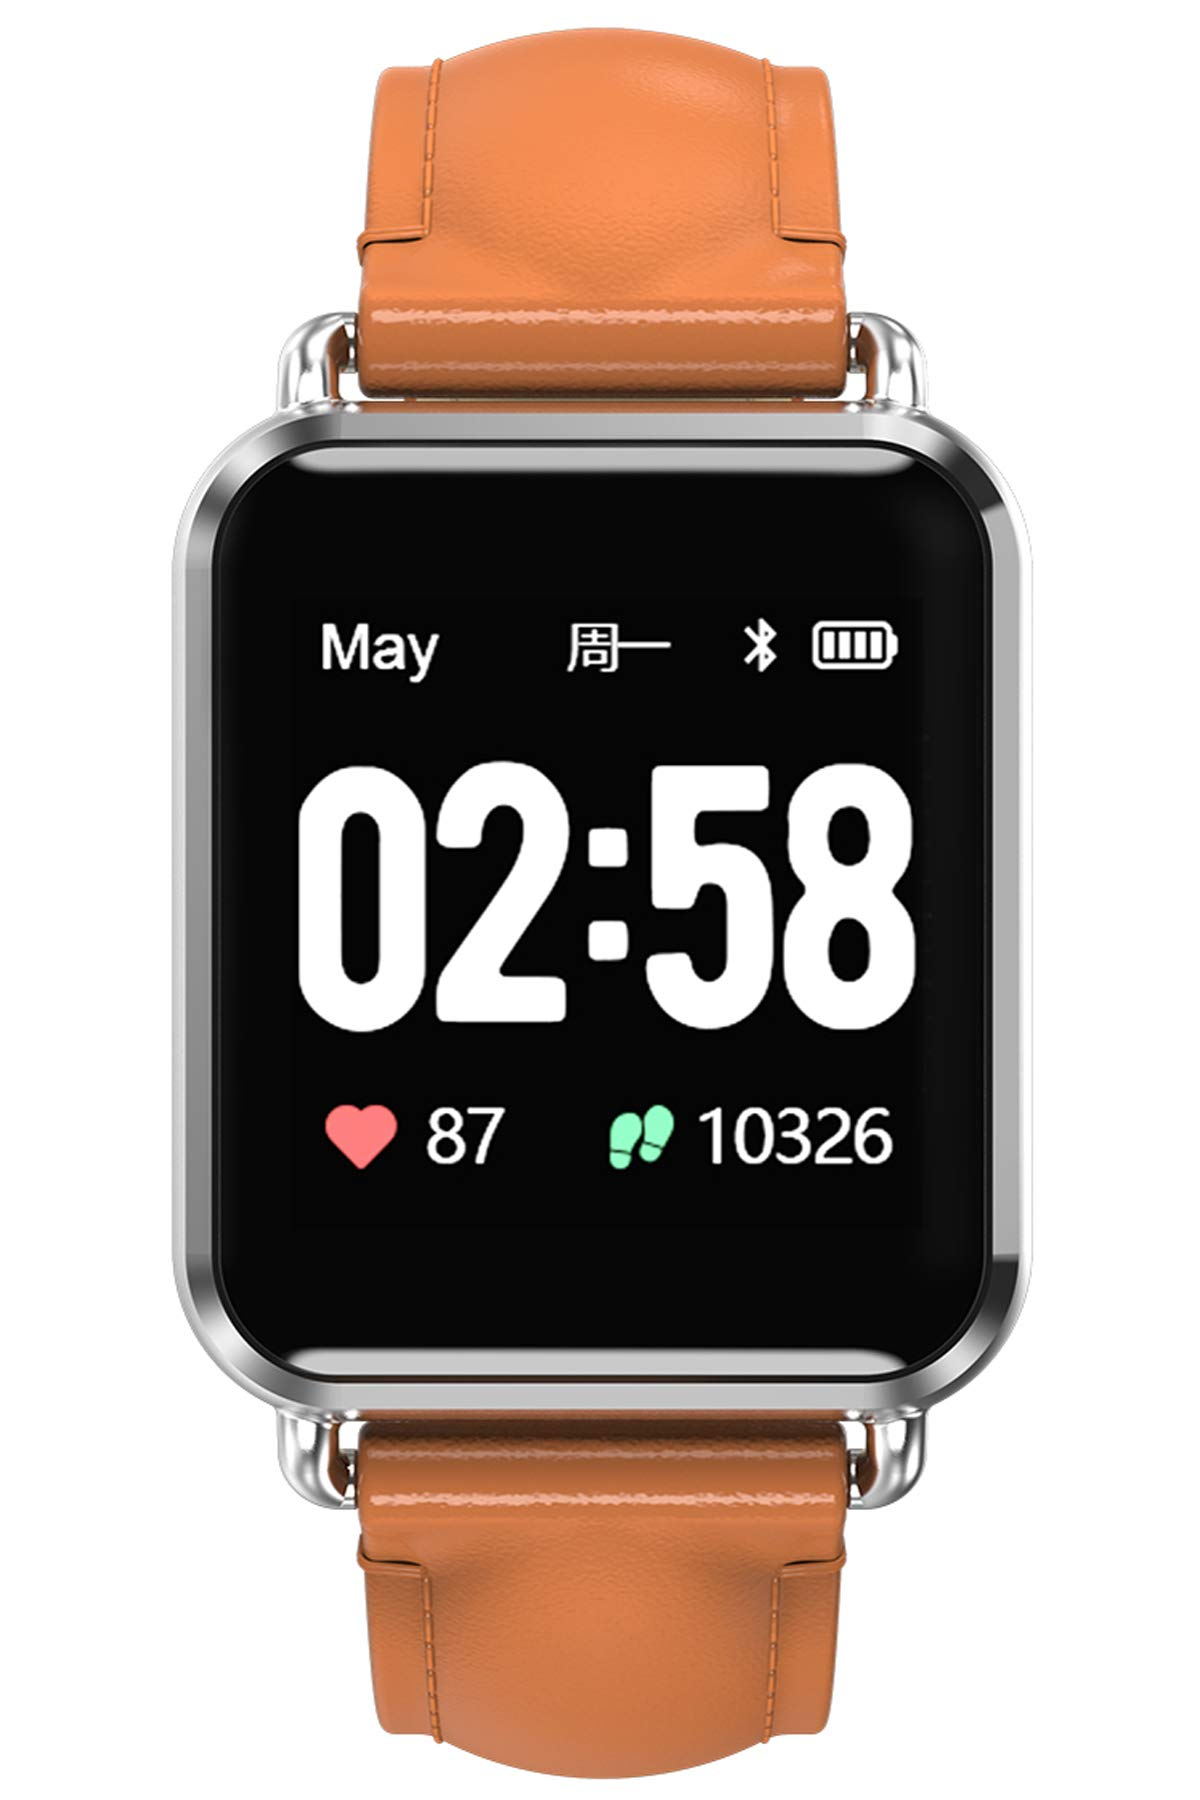 Fitness Tracker Smart Watch ECG Heart Rate Monitor Blood Pressure Sleep Monitor Activity Tracker Smart Bracelet